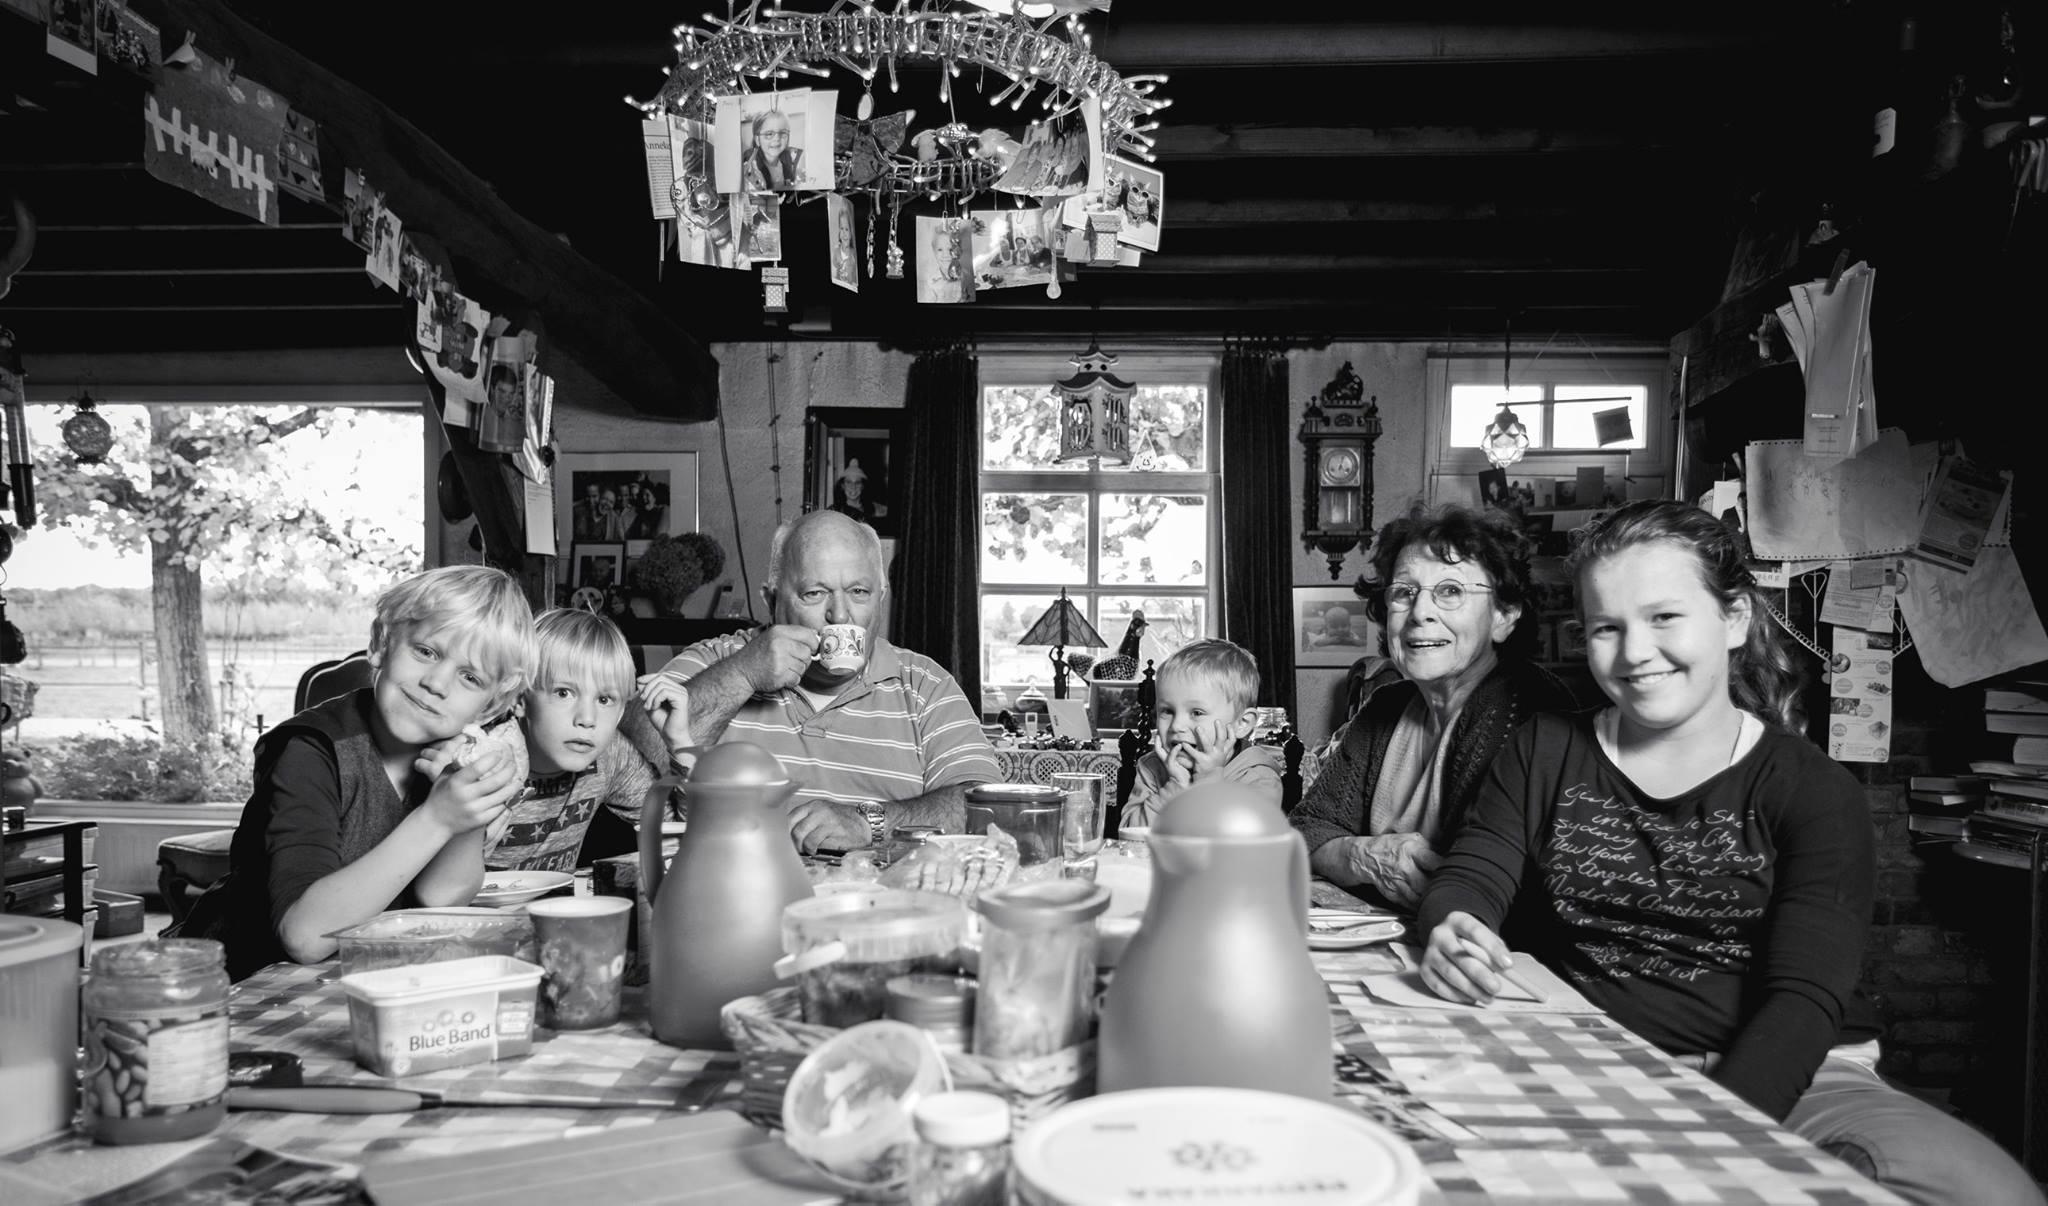 Opi en Omi Brom met hun kleinkinderen Joep, Gust, Max en Lotte.